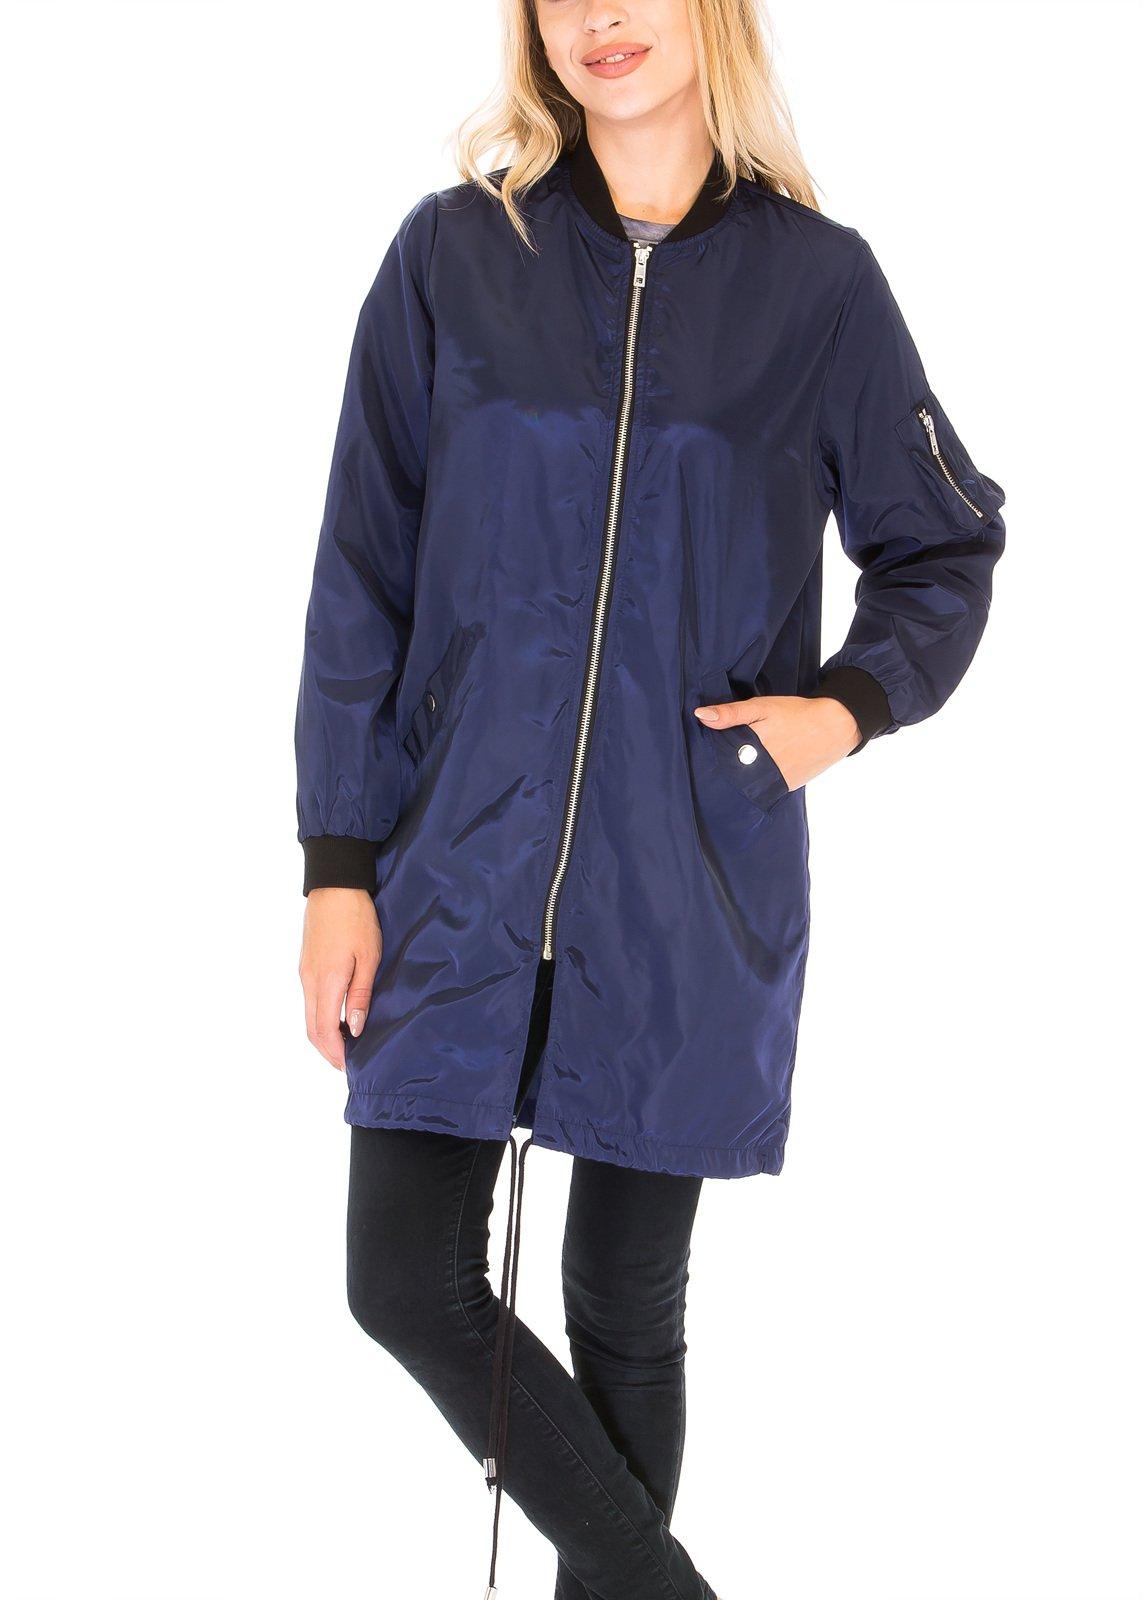 Luna Flower Women's Classic Long Coat Jacket-Zip Up Light Bomber Jackets Navy Medium (GJAW163)